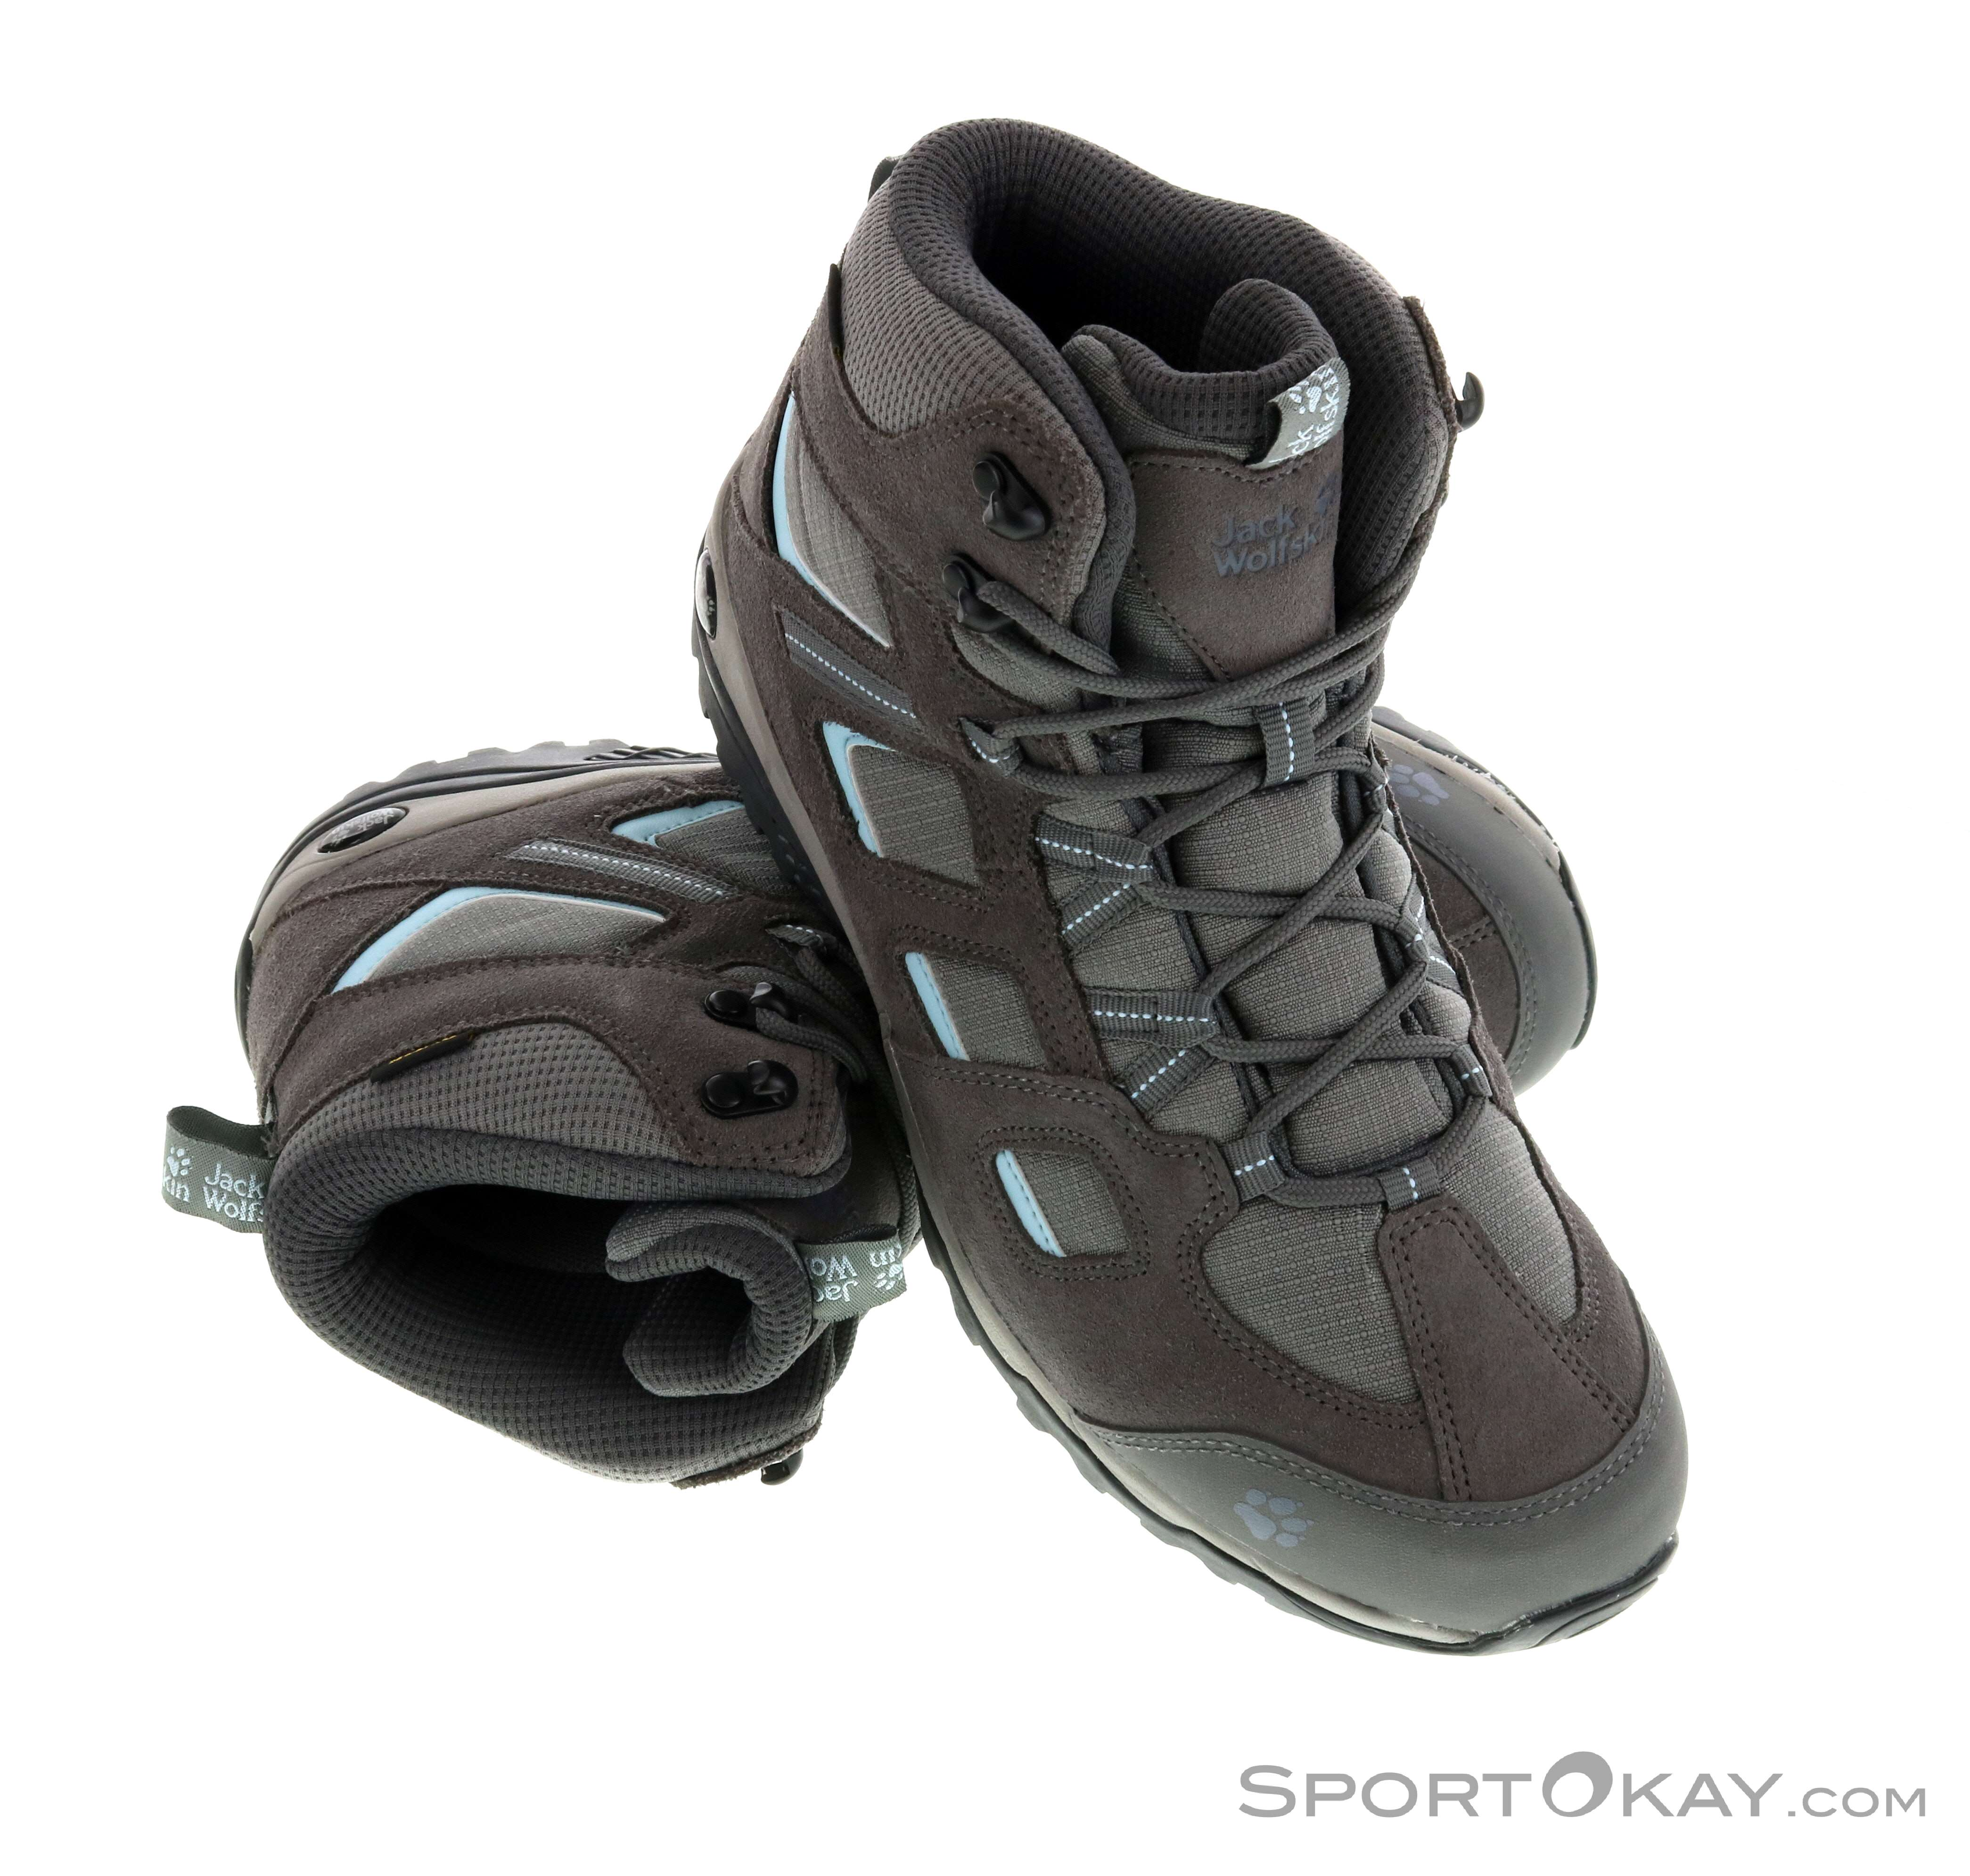 4ef2b69fb4 Jack Wolfskin Vojo Hike 2 Texapore Mid Womens Hiking Boots , Jack Wolfskin,  Gray,